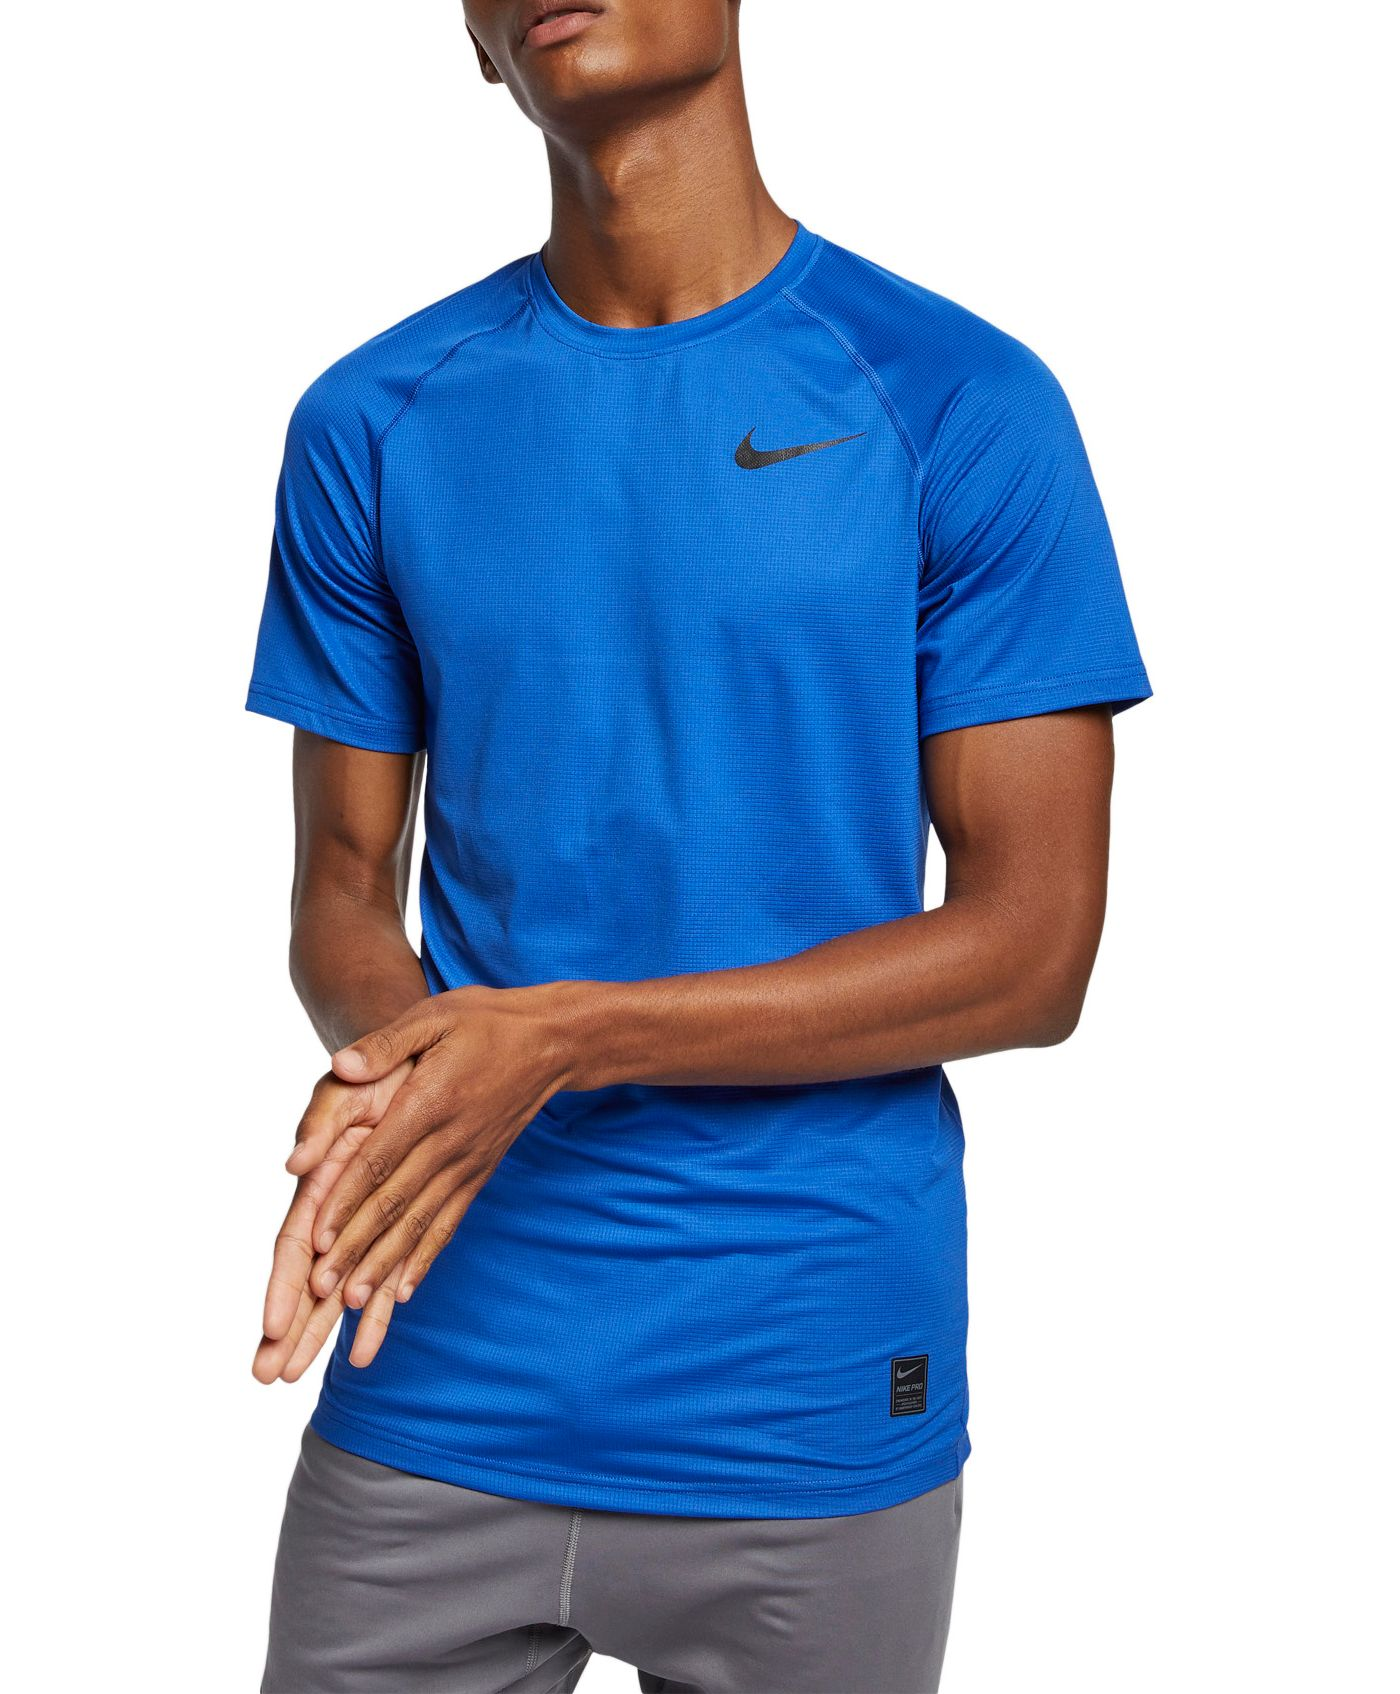 Nike Men's Pro Breathe Tee